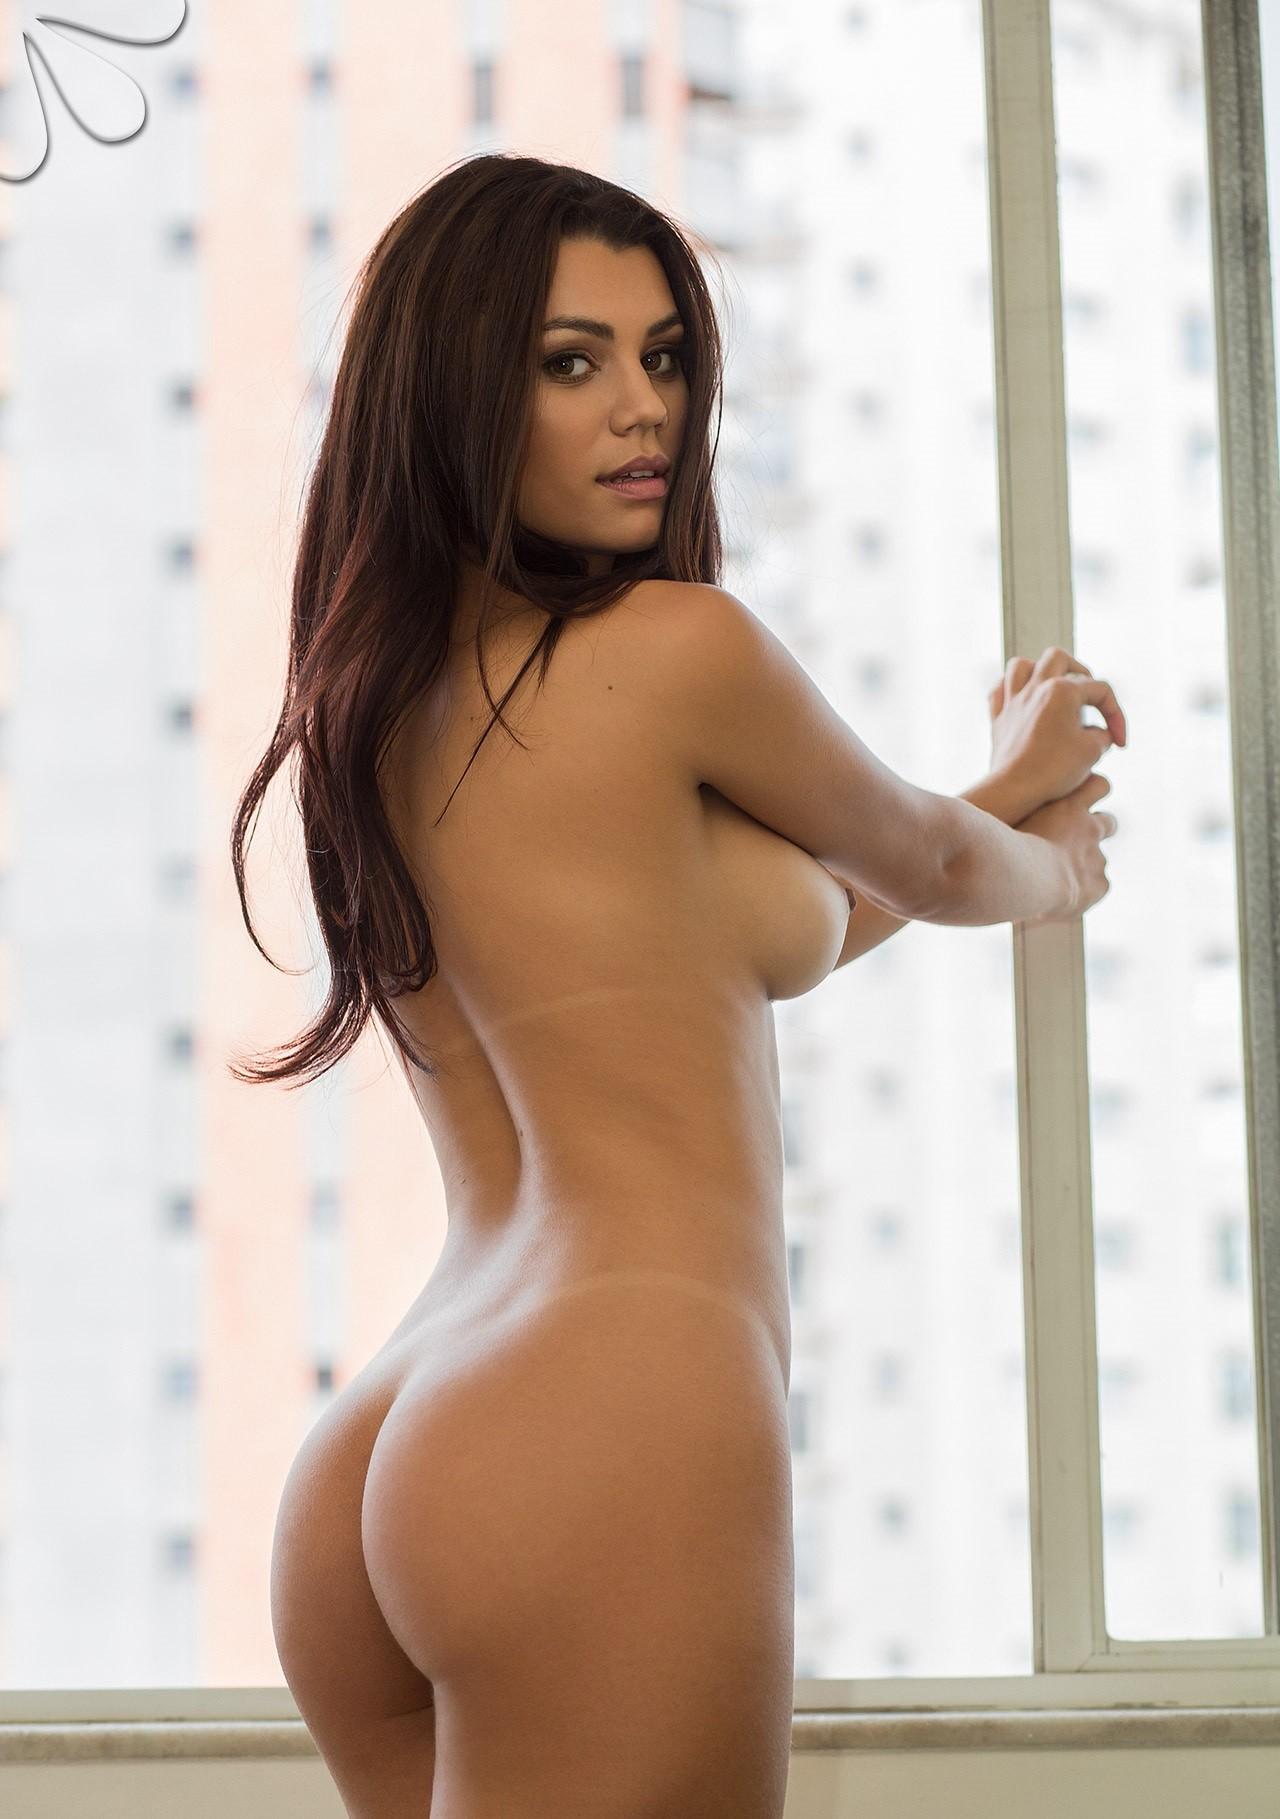 francielli-fontana-nude-brazilian-black-lingerie-camera-bellada-semana-16